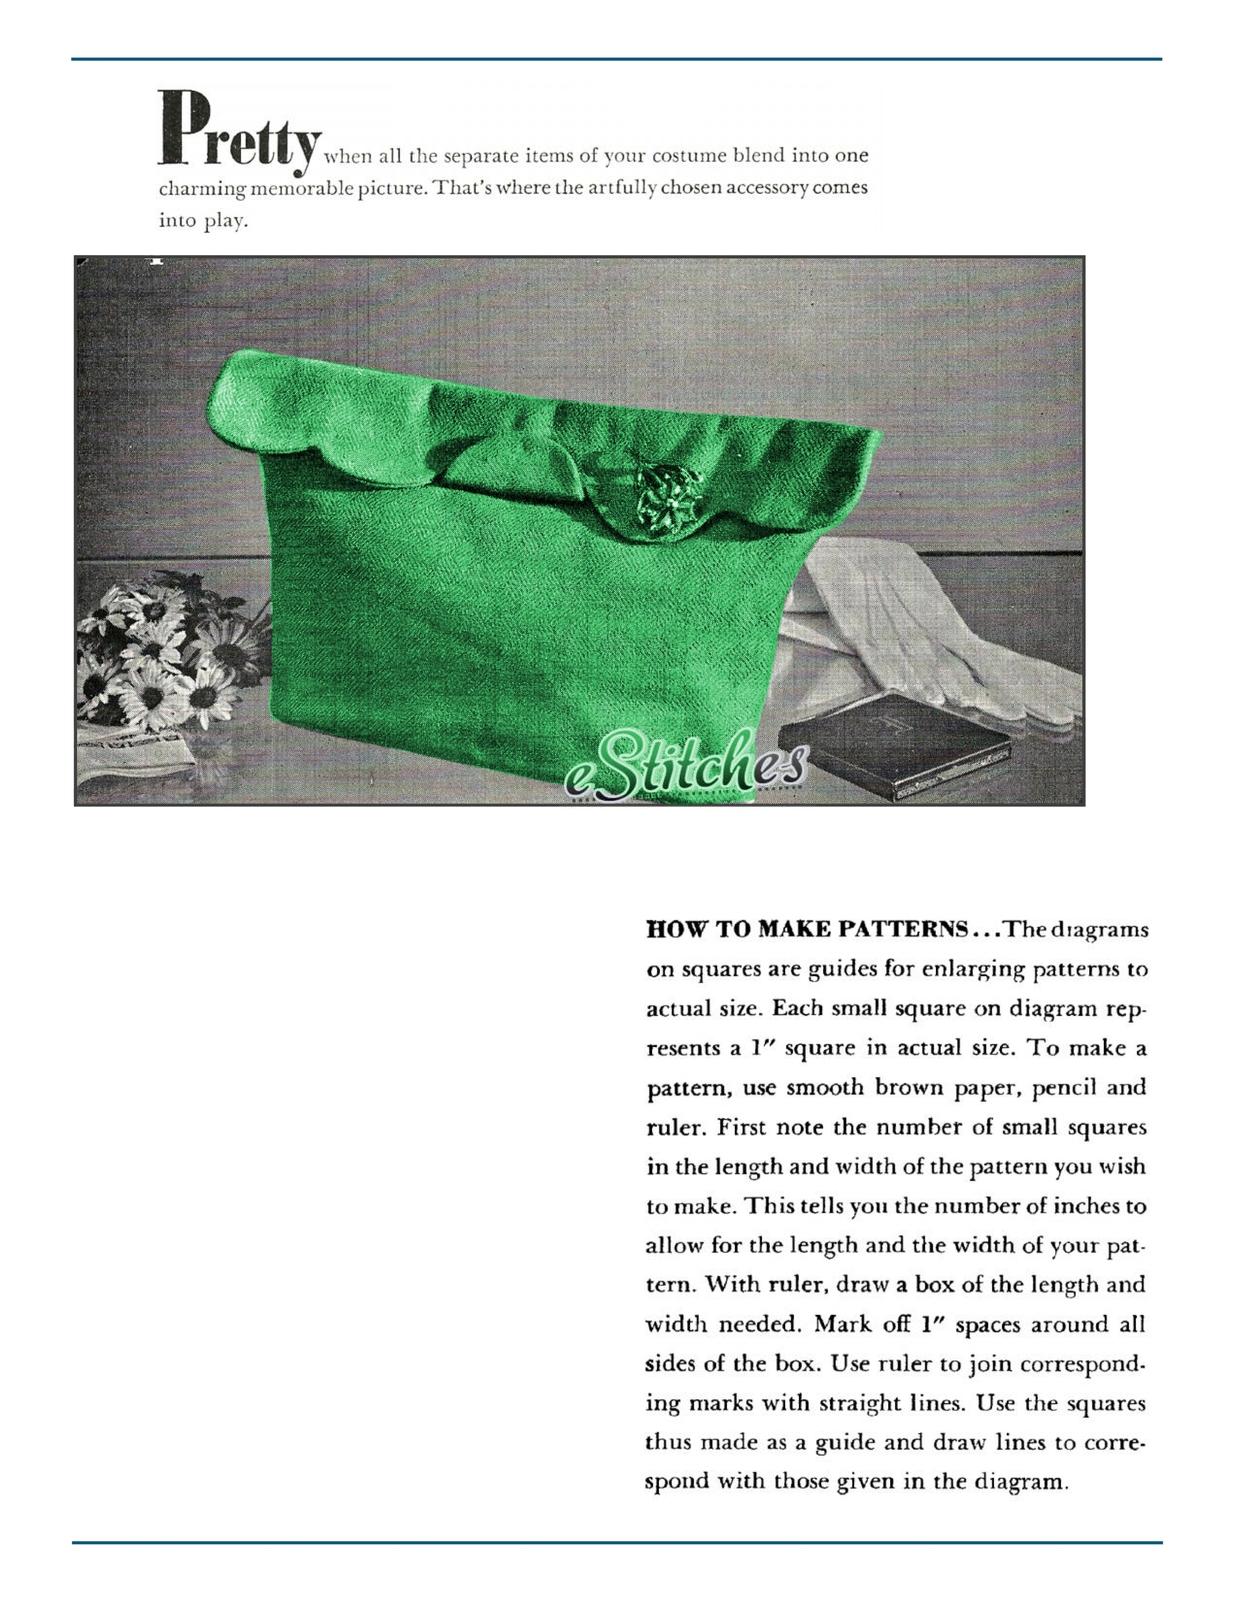 Bag scalloped envelope 1704 001a